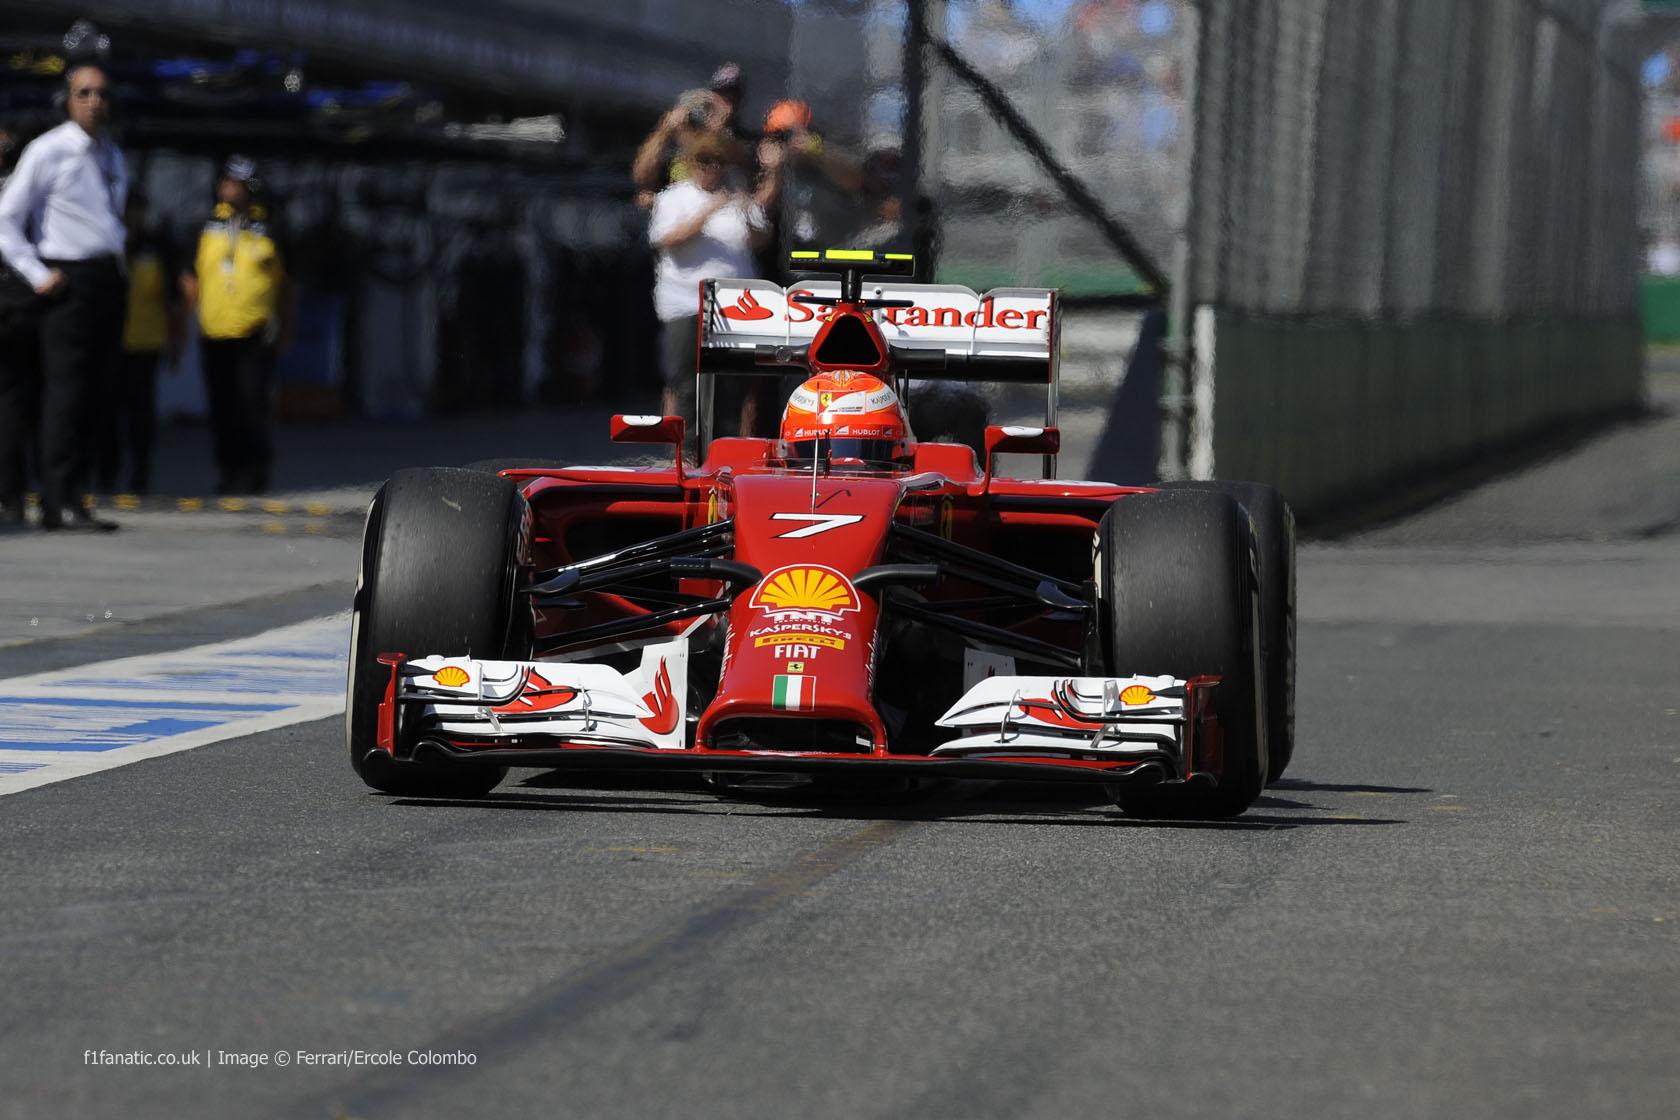 Kimi Raikkonen, Ferrari, Albert Park, 2014